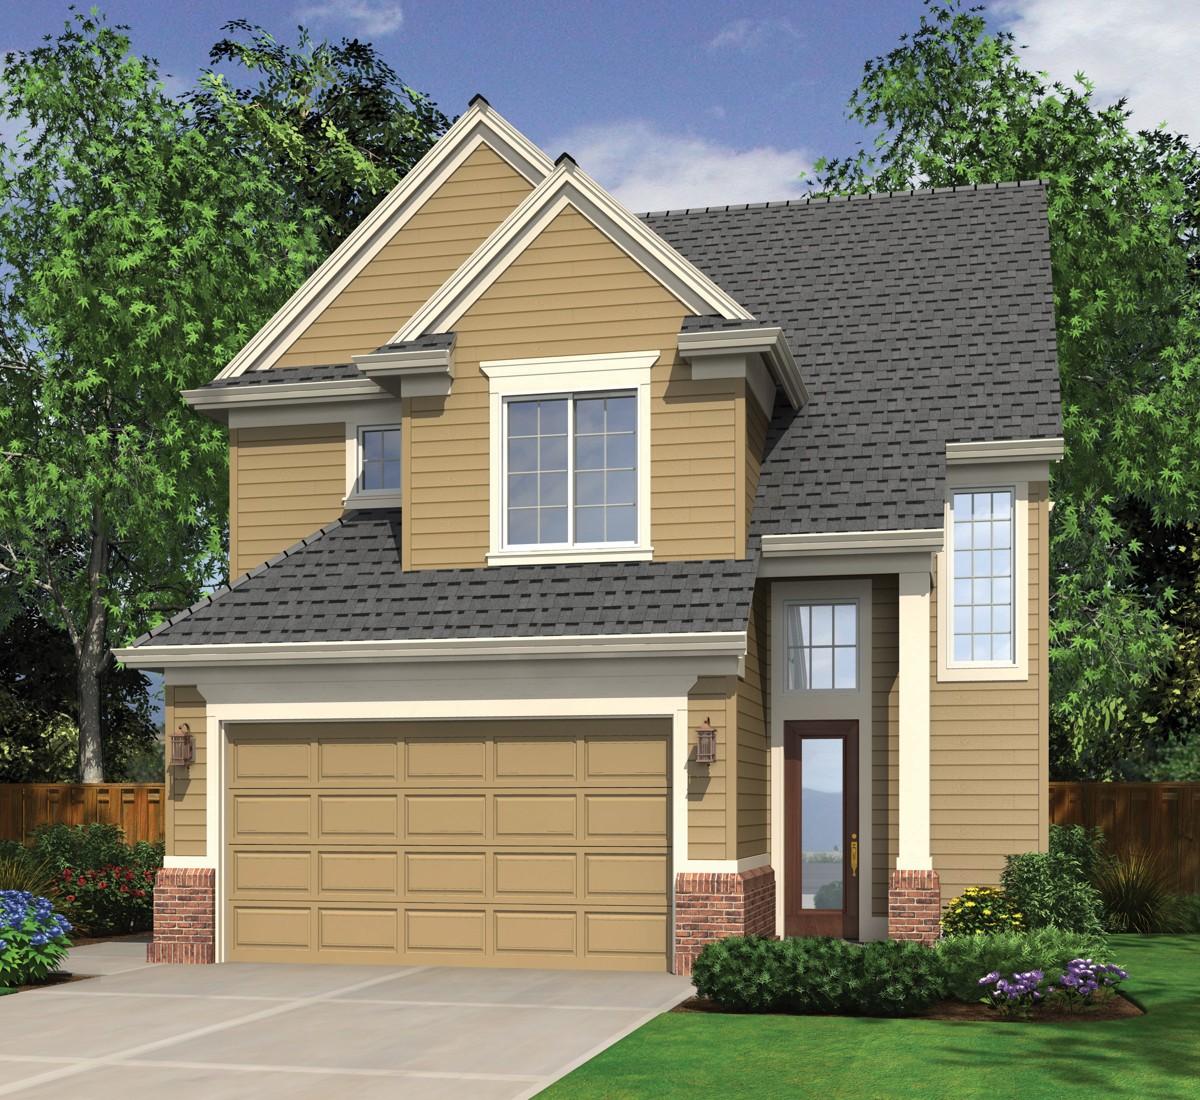 Open Living Area - 6905am Architectural Design House